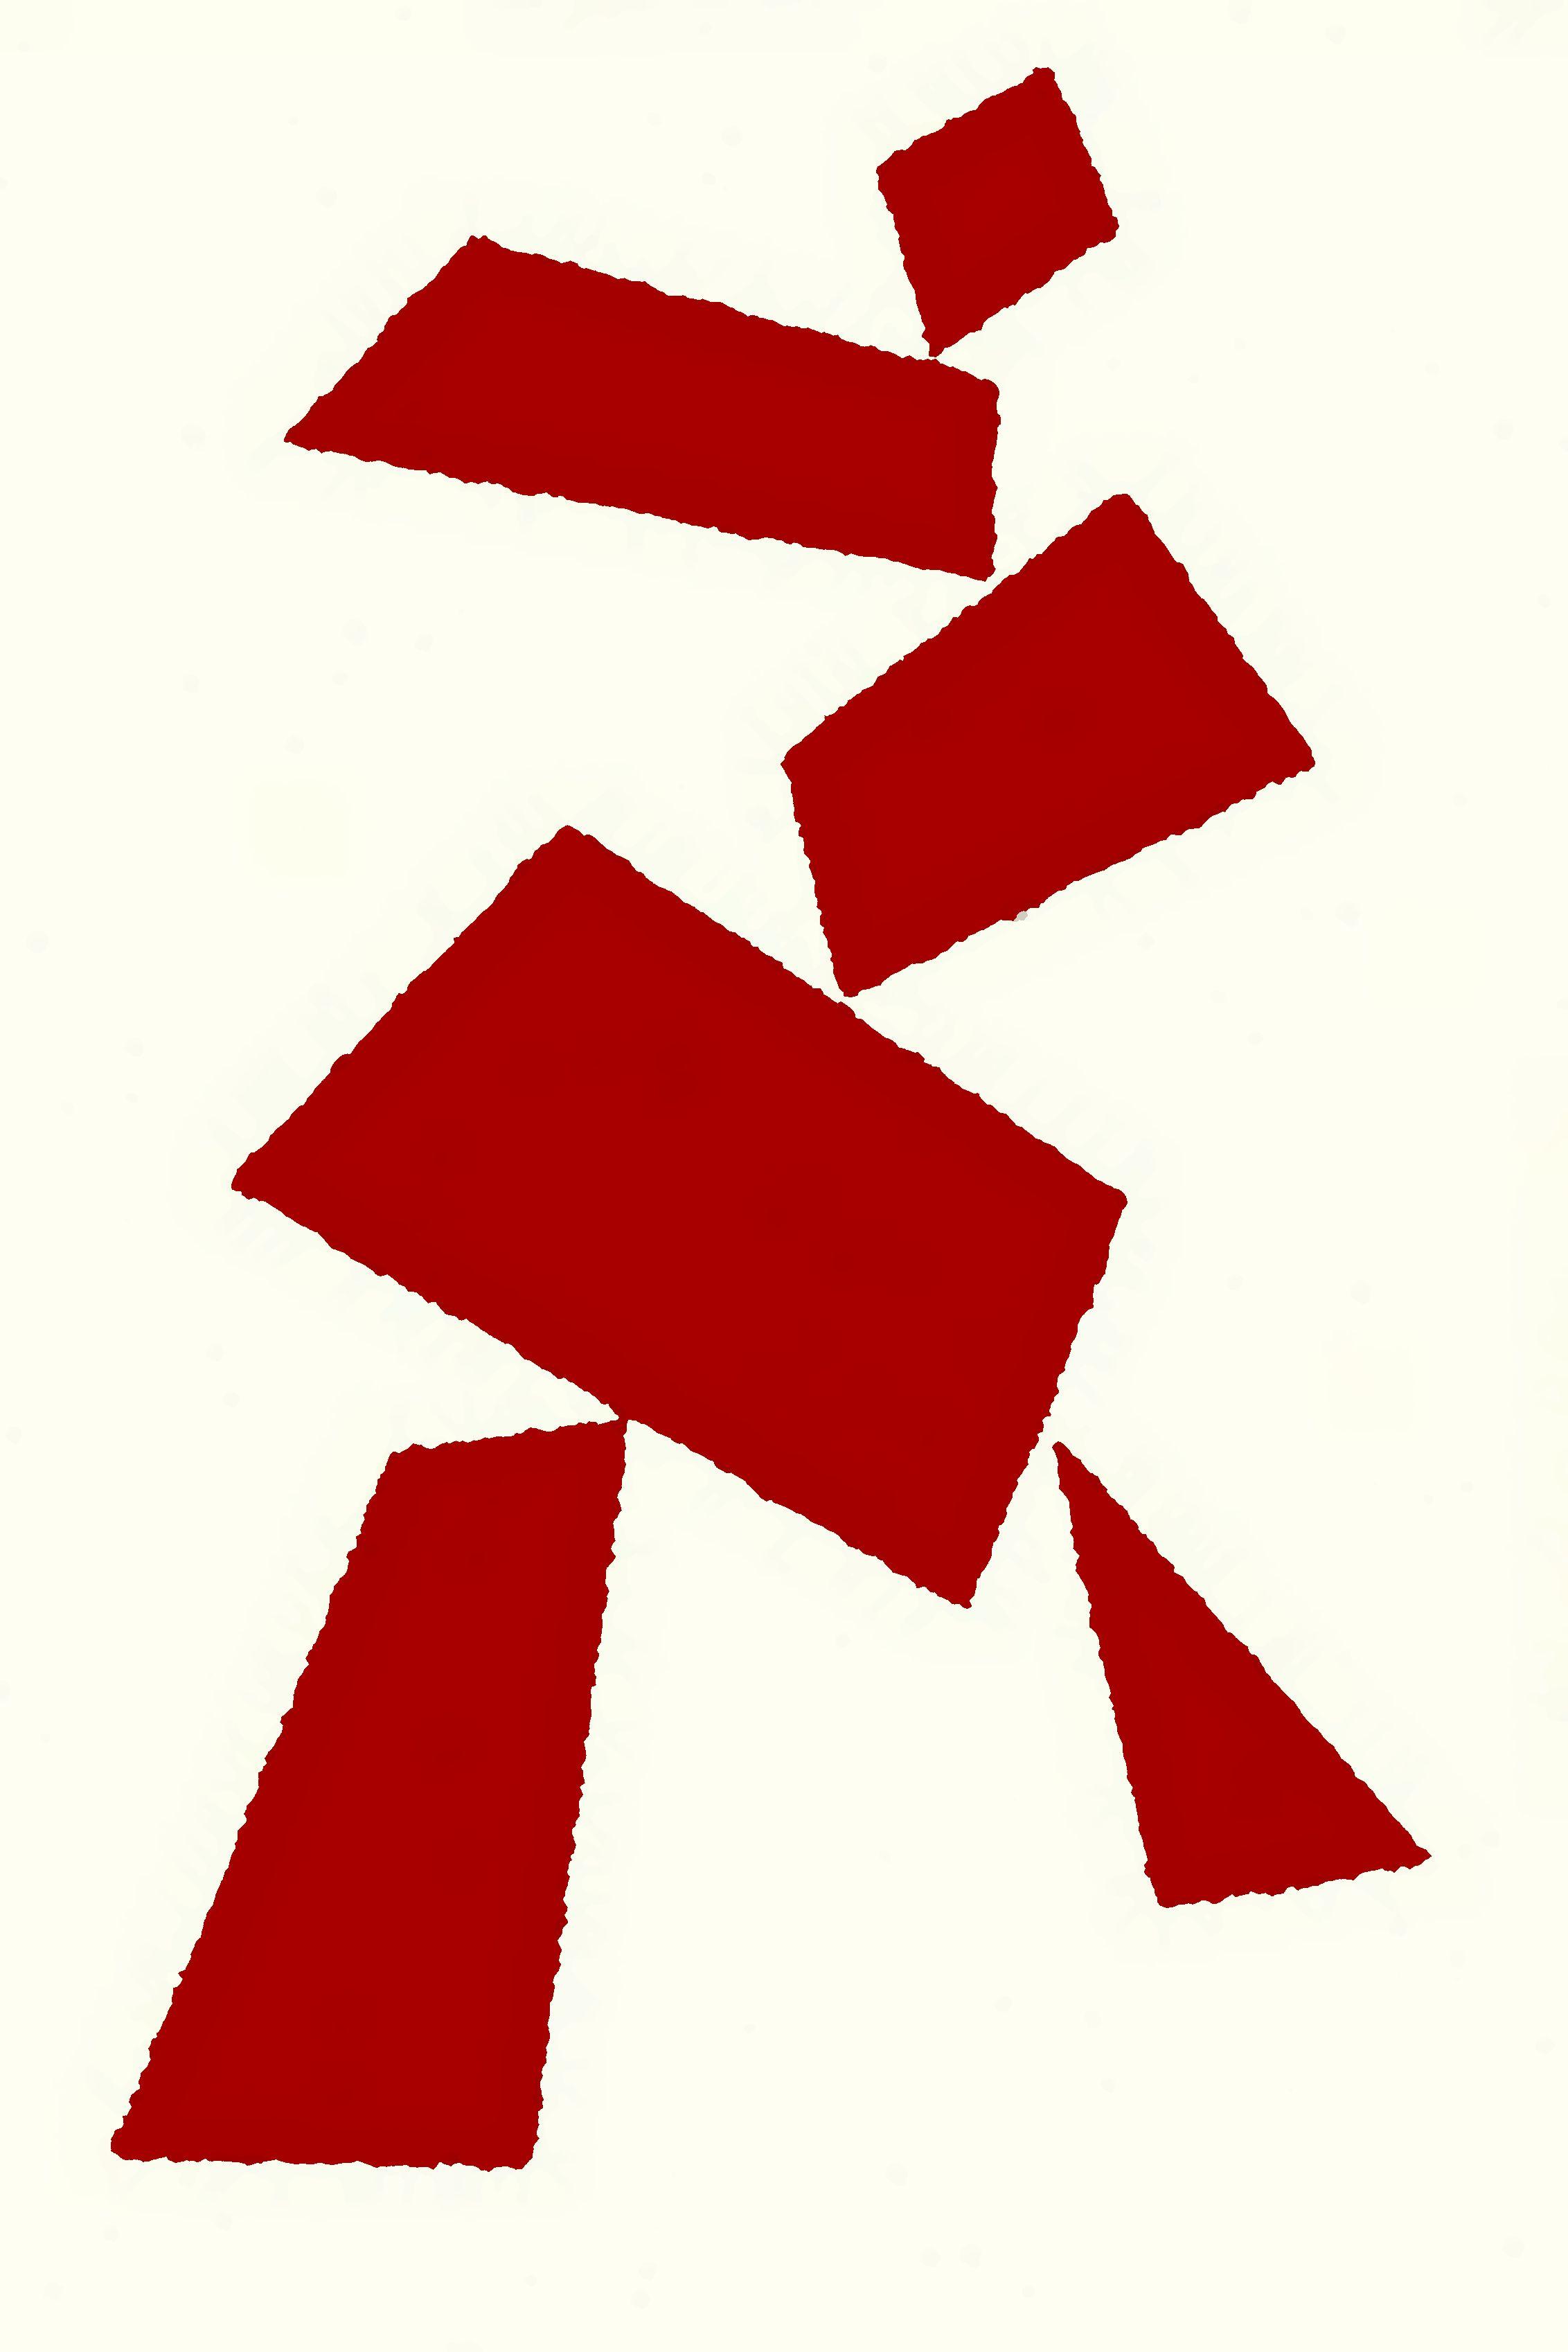 kinetic form